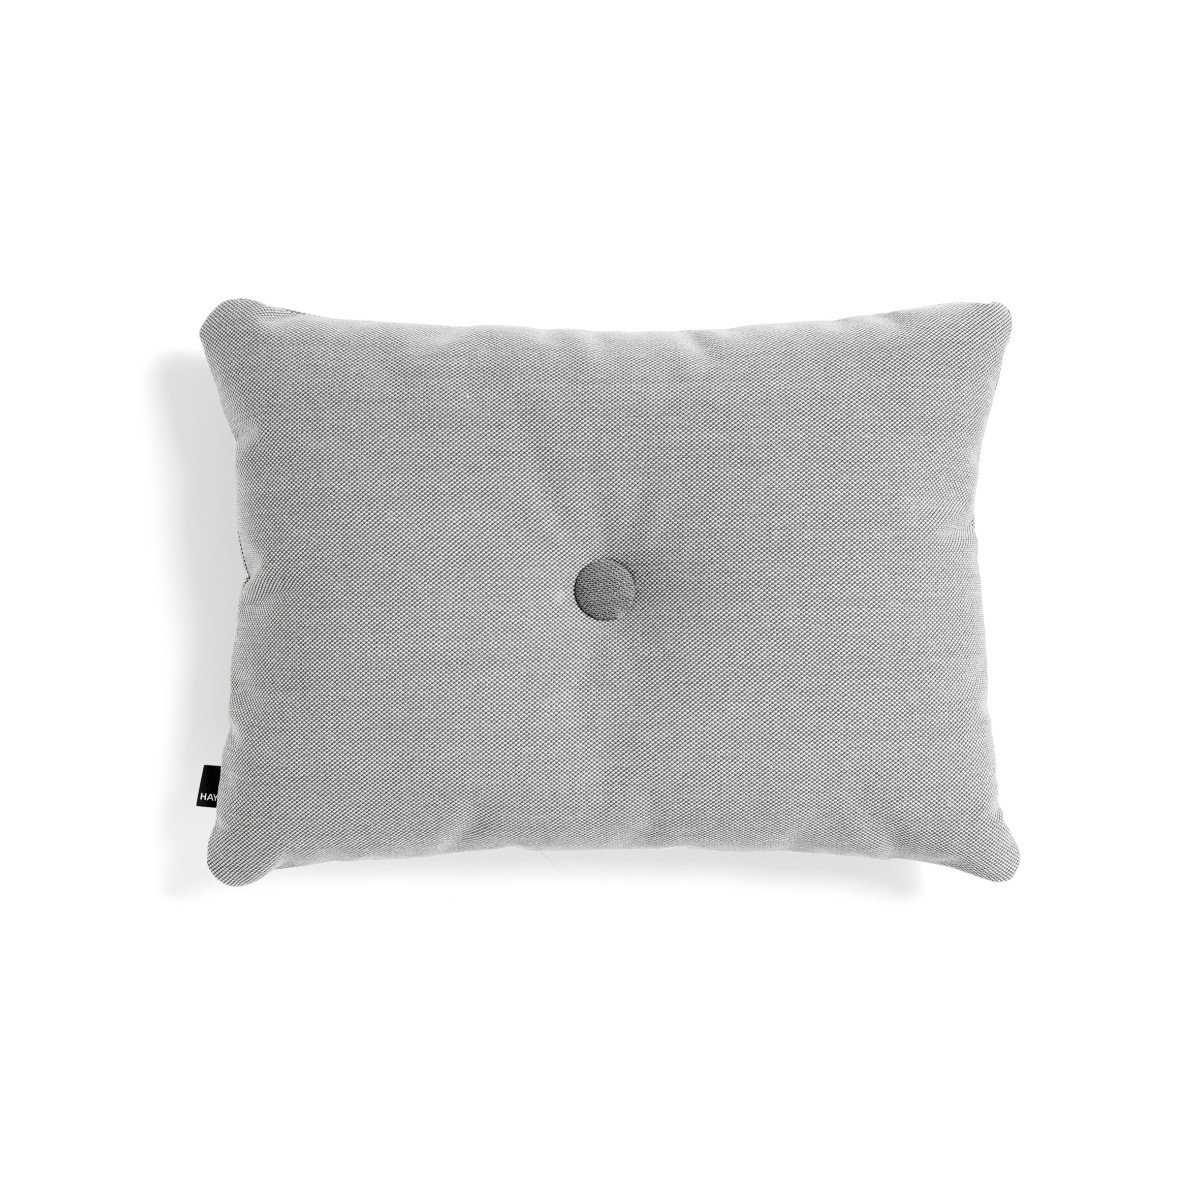 HAY Dot Cushion Steelcut pyntepude, 45x60 cm